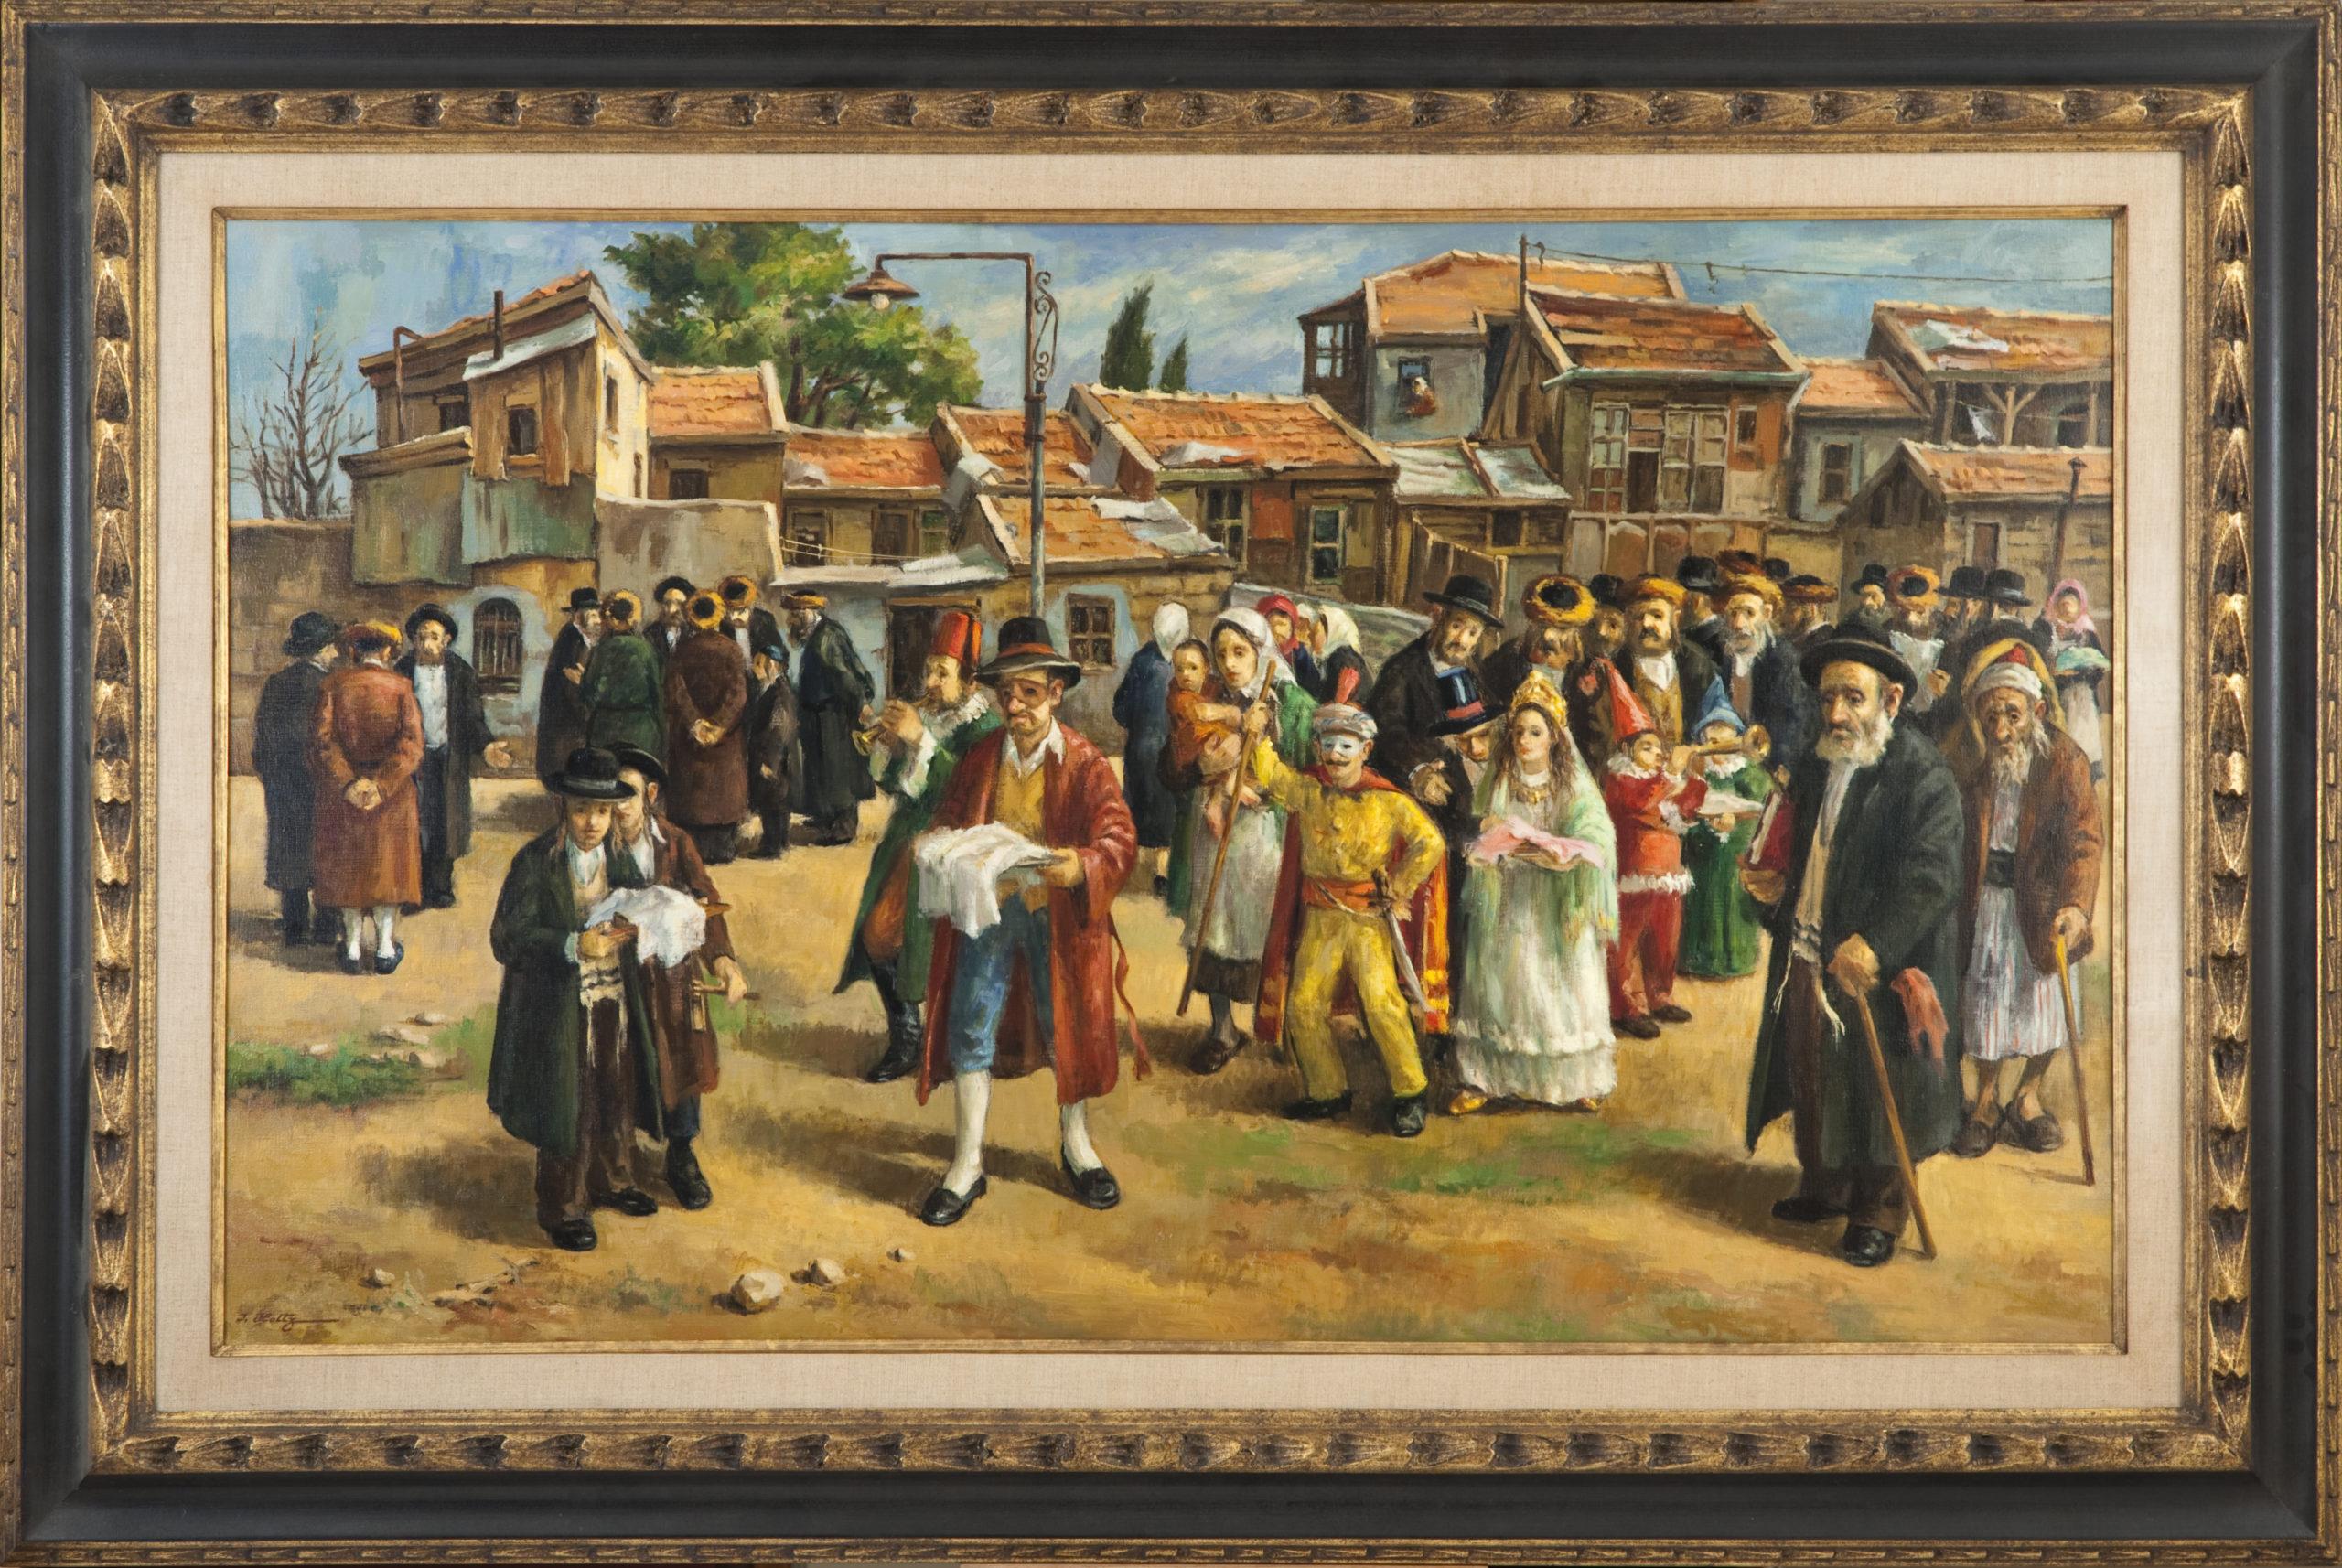 292 Purim Jerusalem 1967 - Oil on Canvas - 50 x 30 - Frame: 61 x 41 x 2